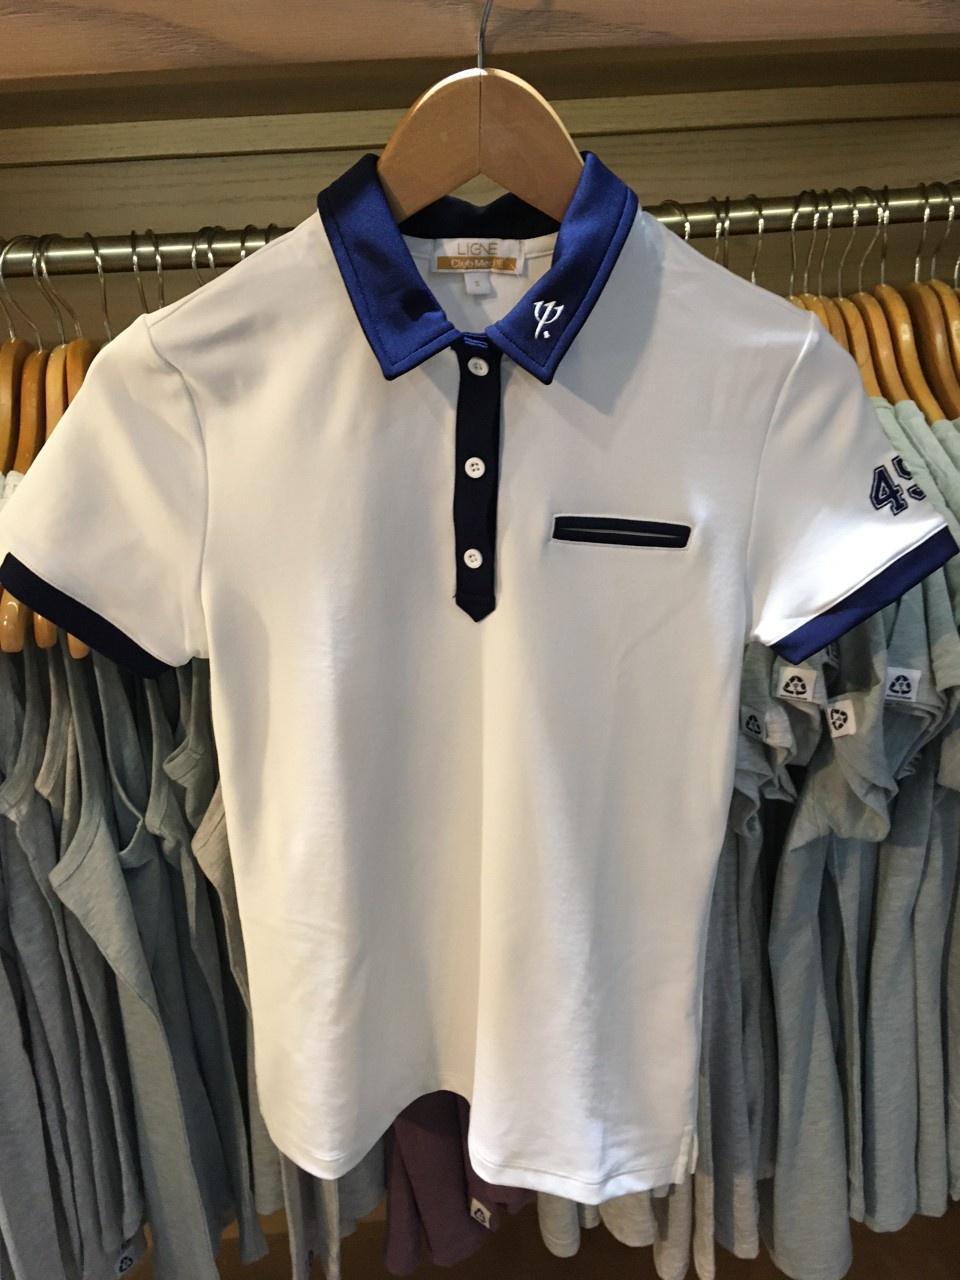 Club Med polo shirt